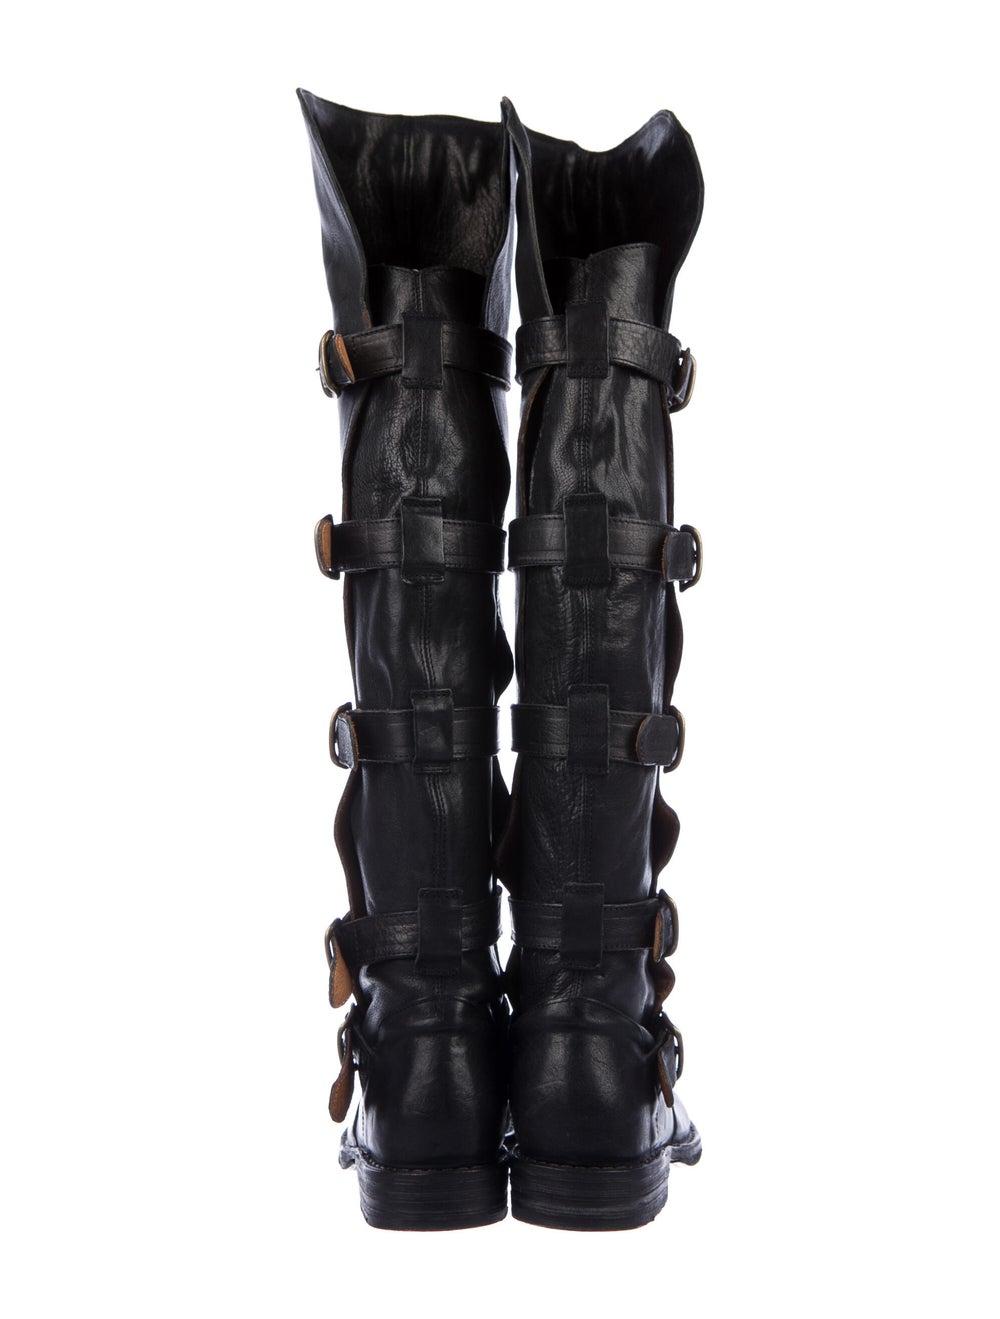 Fiorentini + Baker Leather Combat Boots Black - image 4